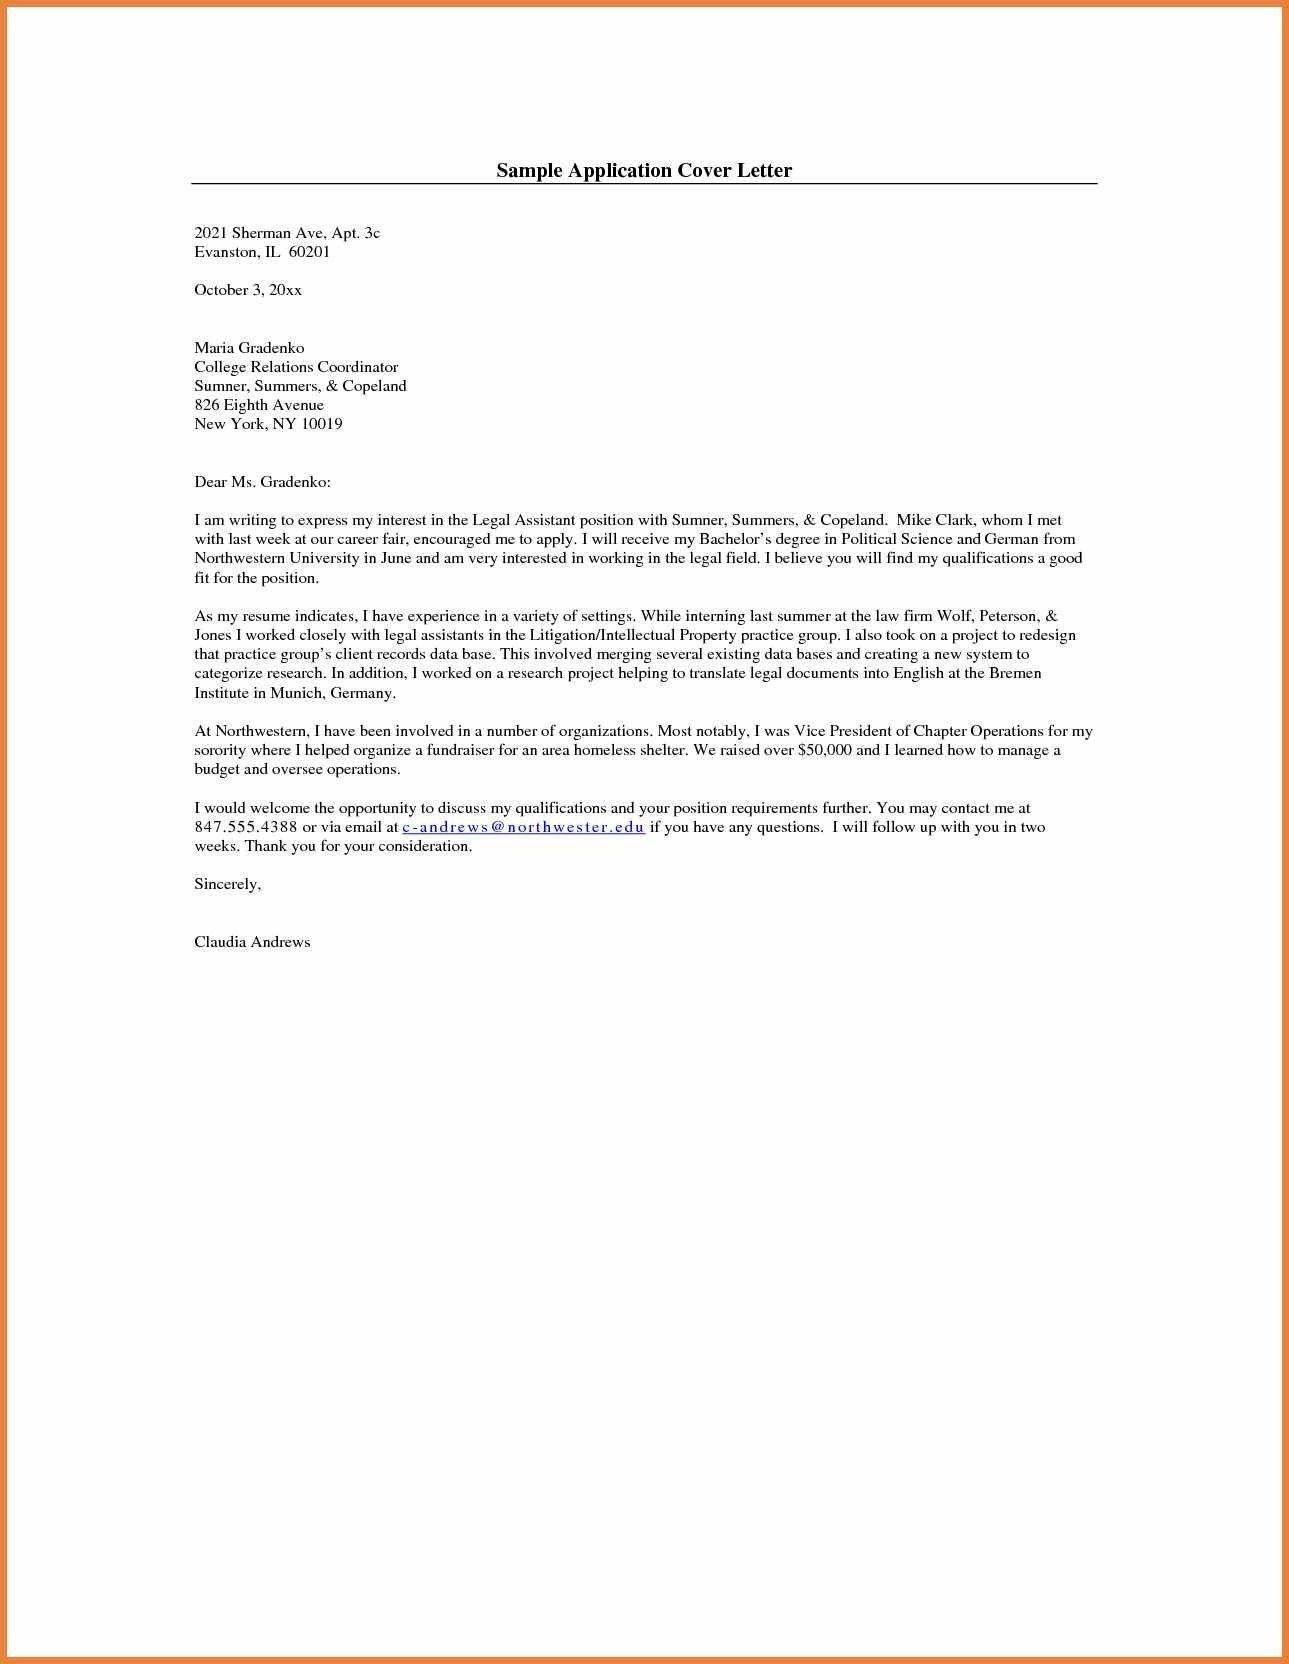 Job Application Cover Letter Format Covering Letter For